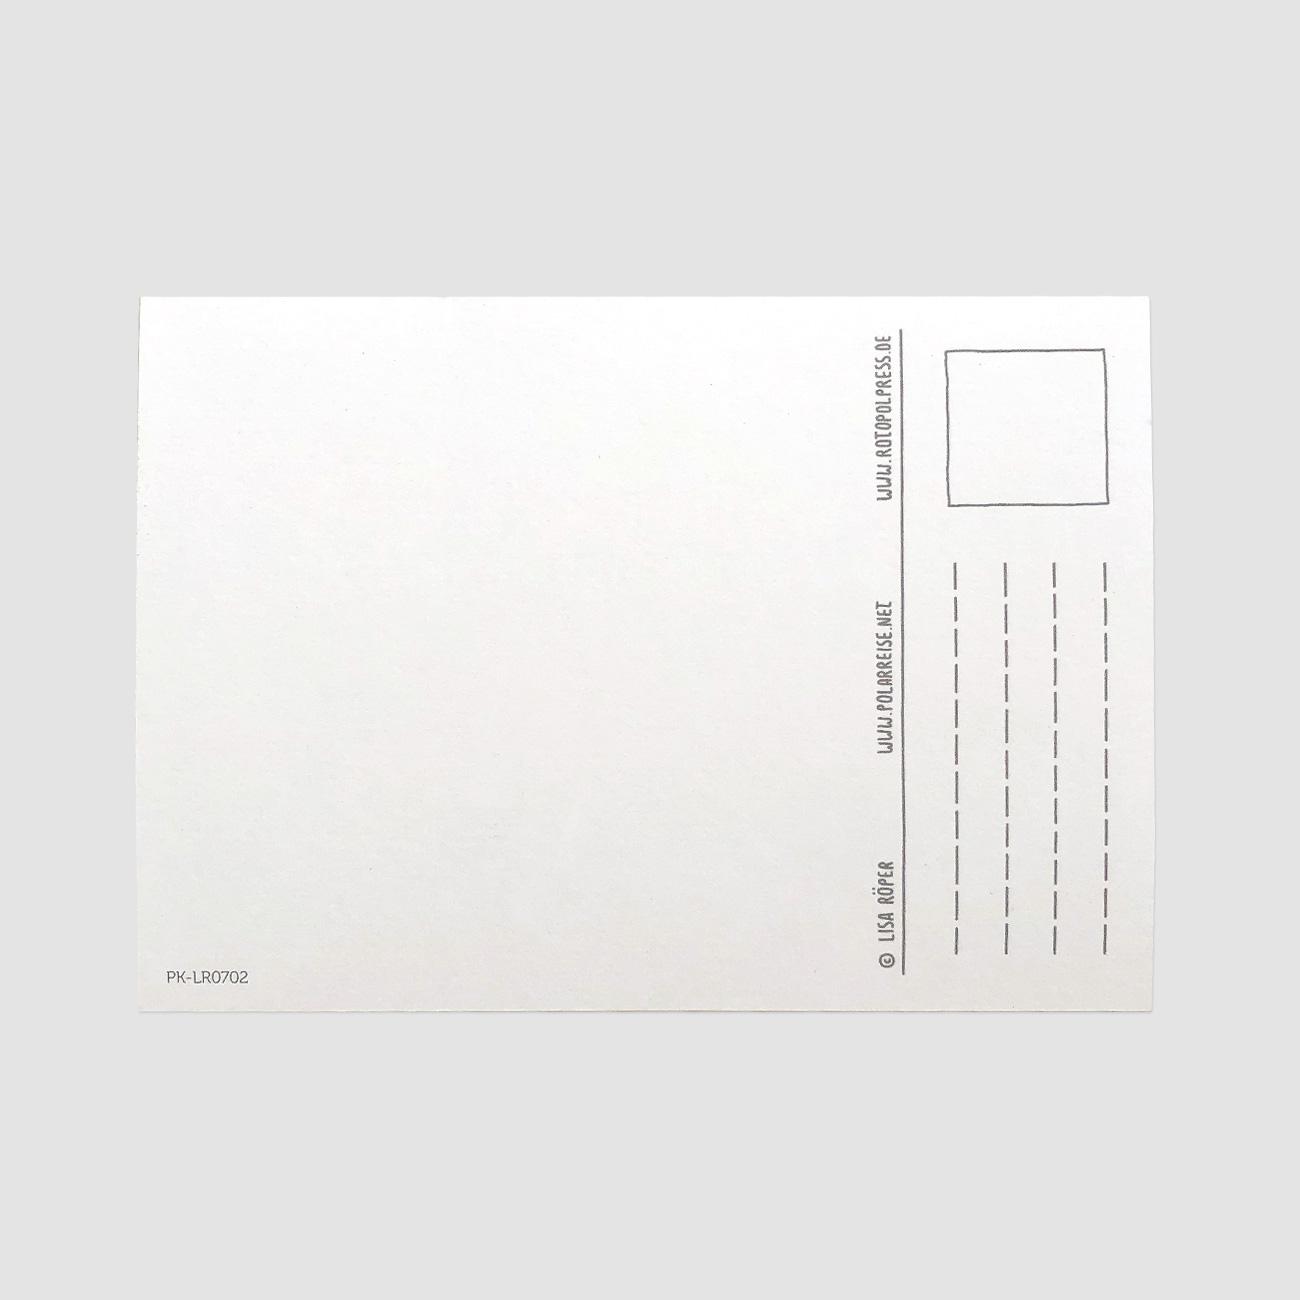 Eismobil, Postkarte, Rückseite, einfarbig, DinA 6,